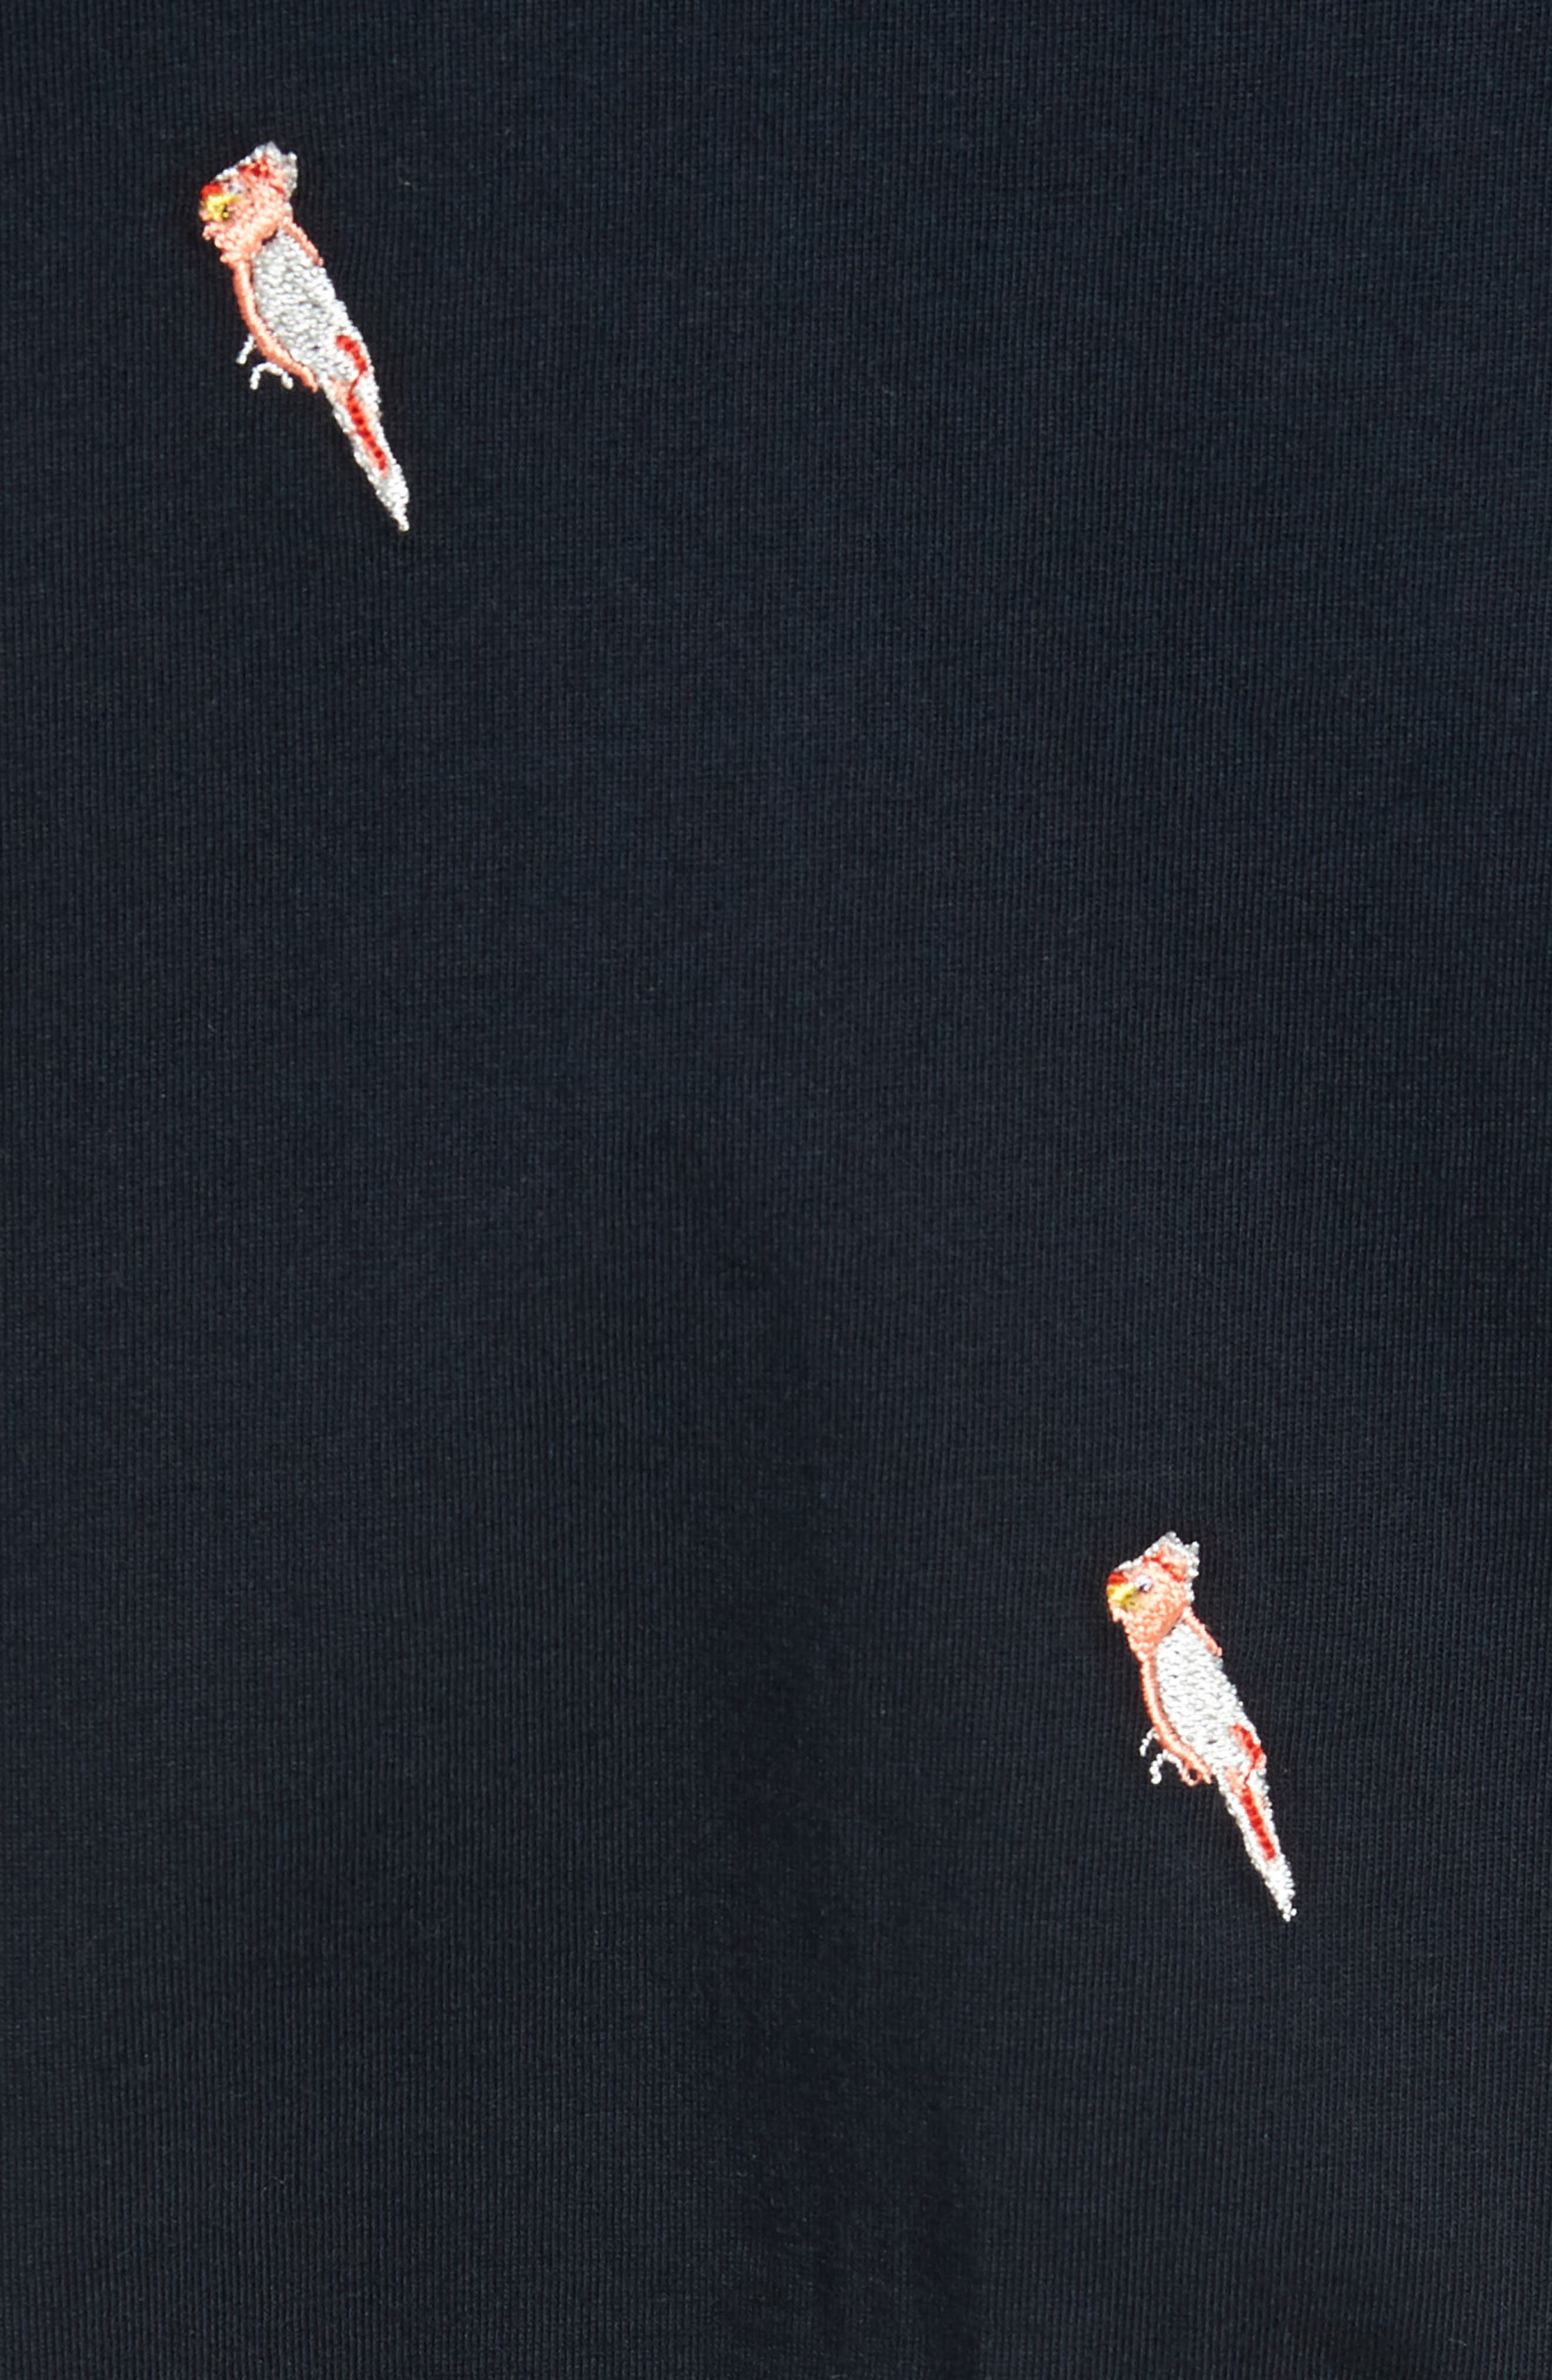 Scrafft Polo Shirt,                             Alternate thumbnail 5, color,